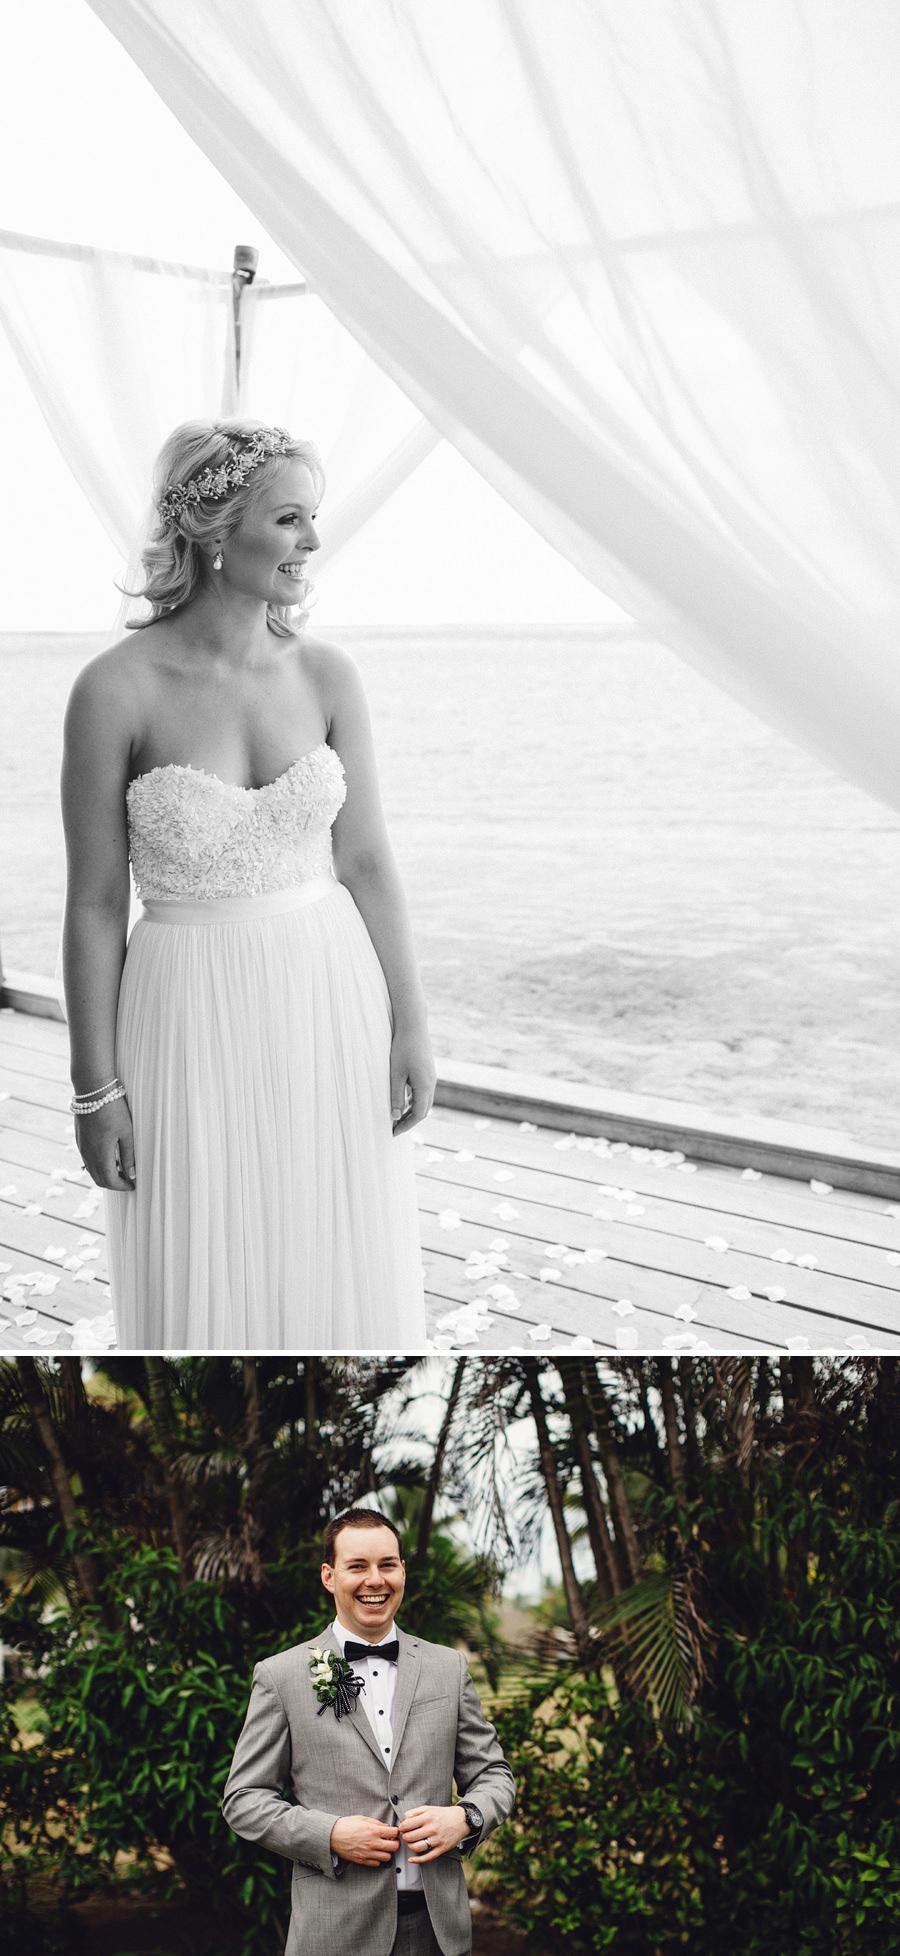 Destination Wedding Photographer: Bride & Groom portraits